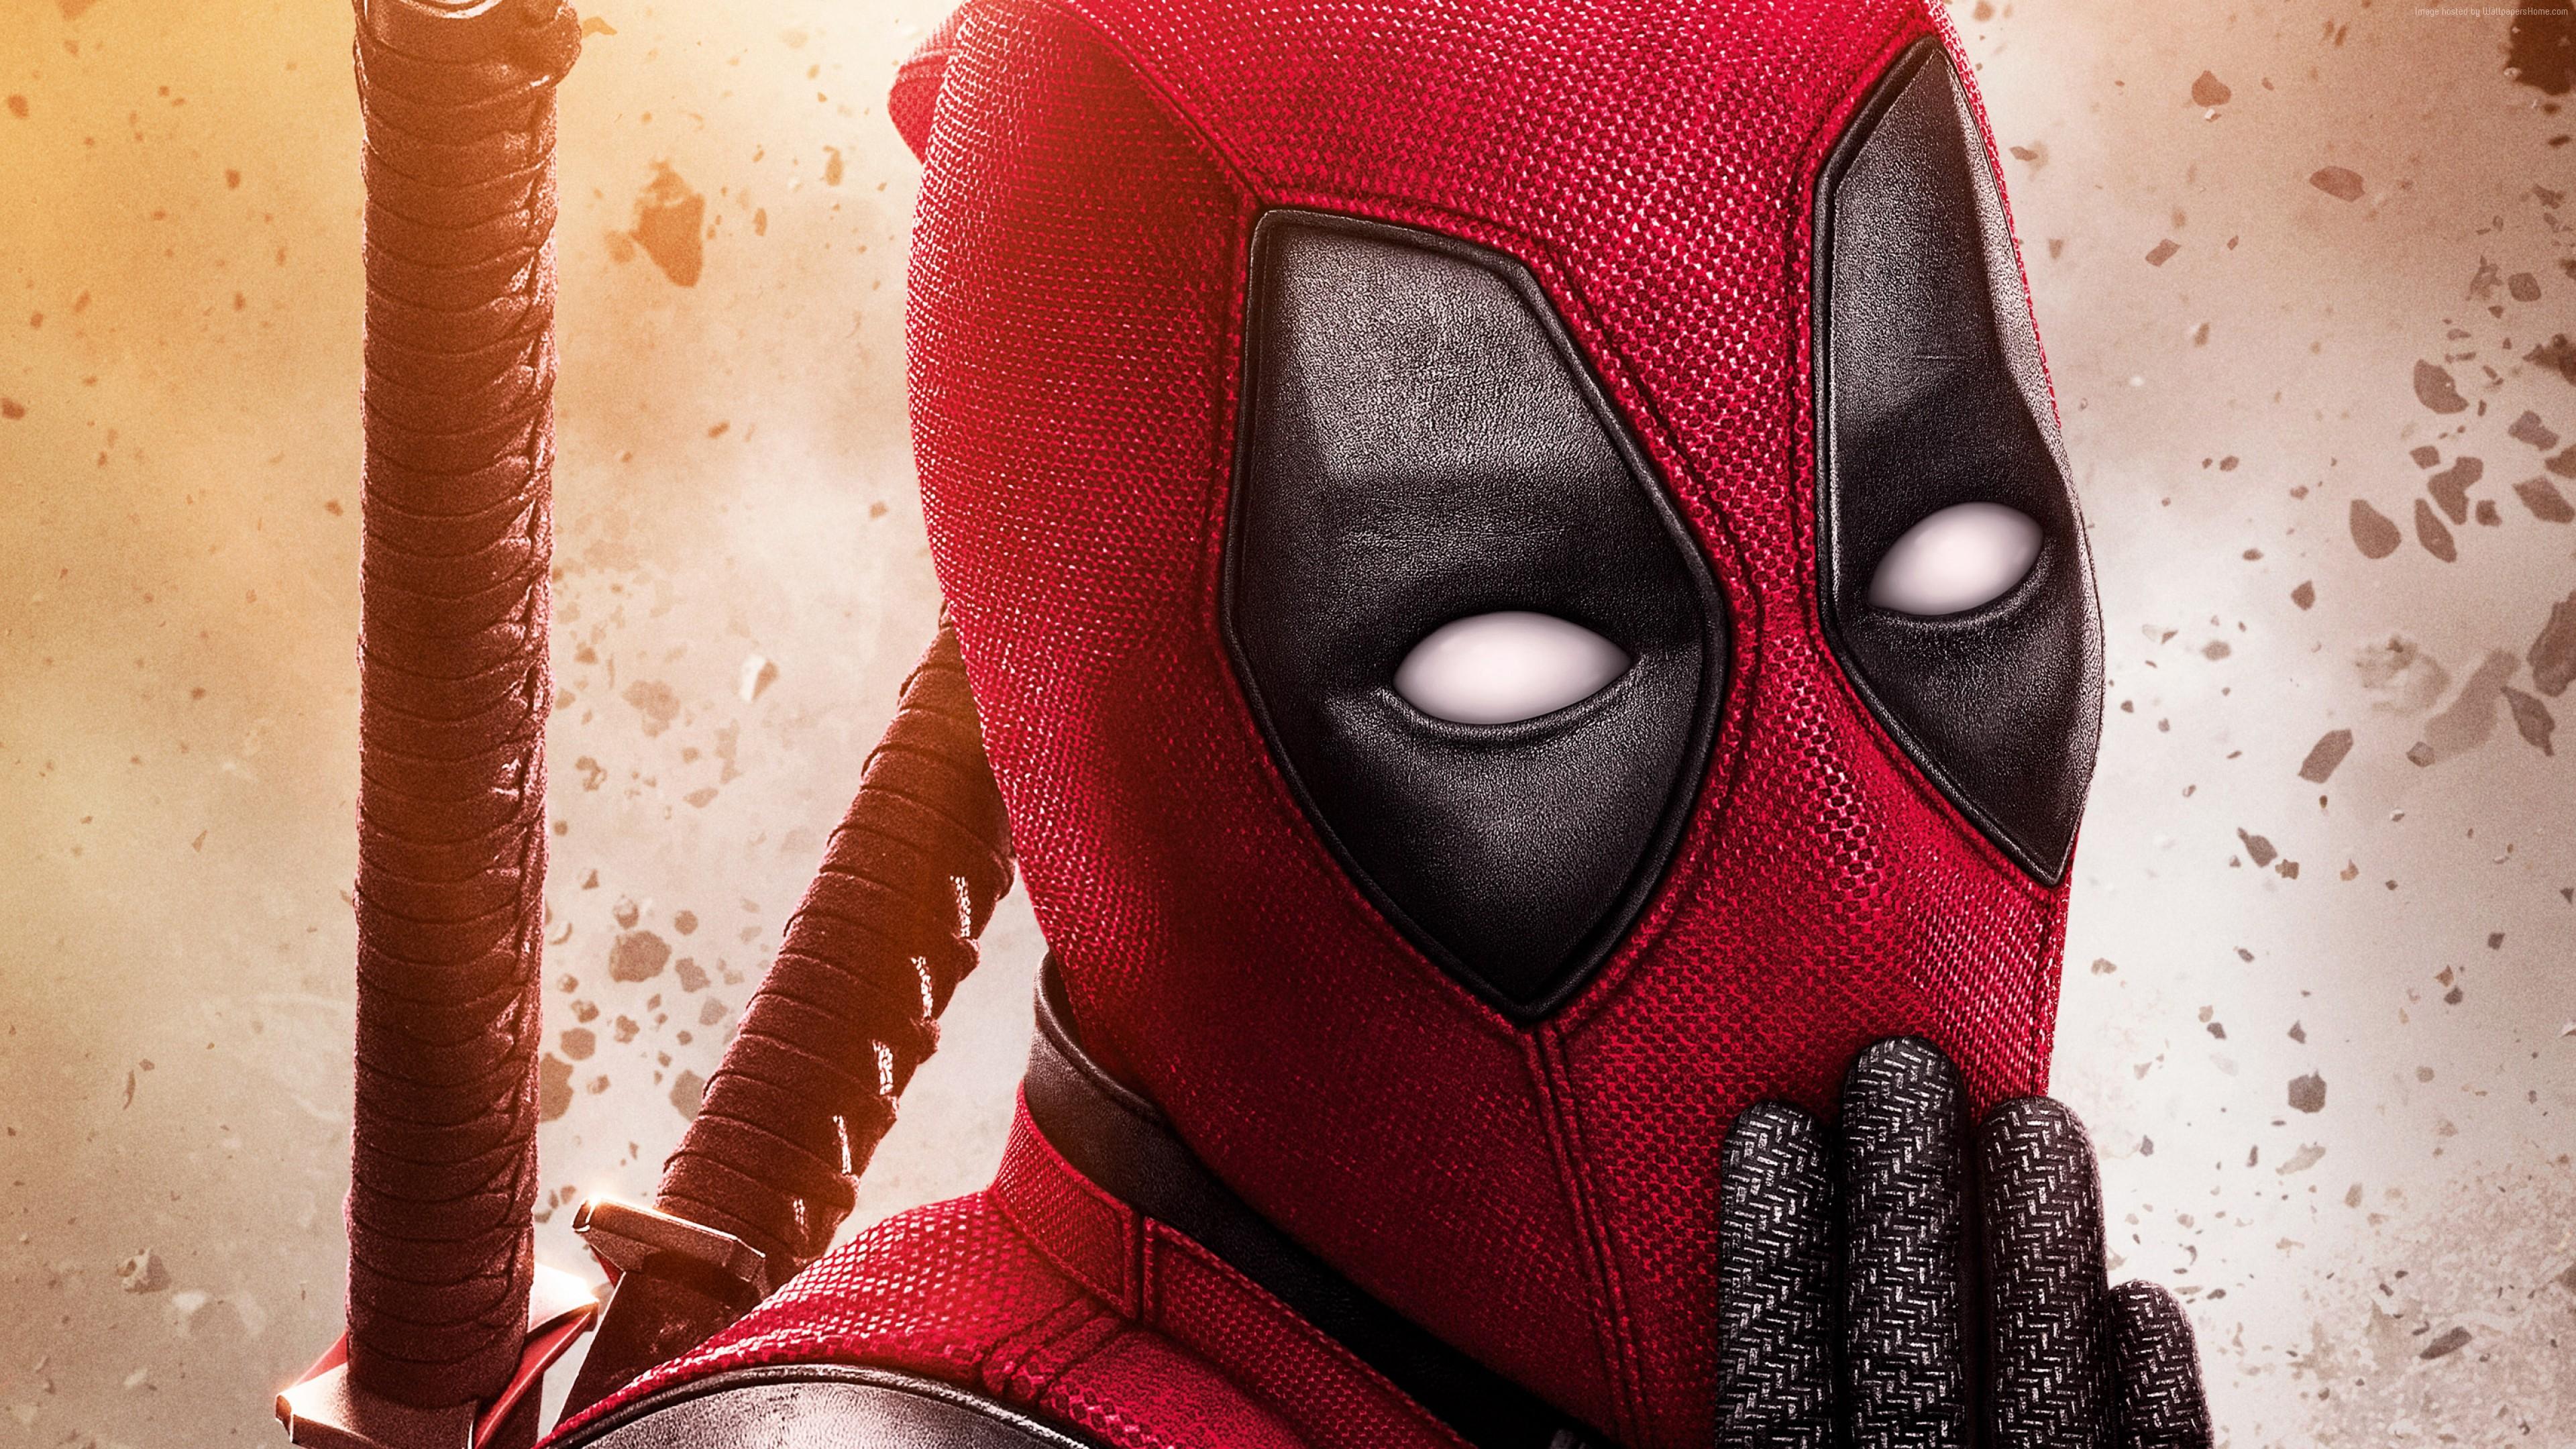 Wallpaper Deadpool 2 Ryan Reynolds 4k Movies Wallpaper Download High Resolution 4k Wallpaper